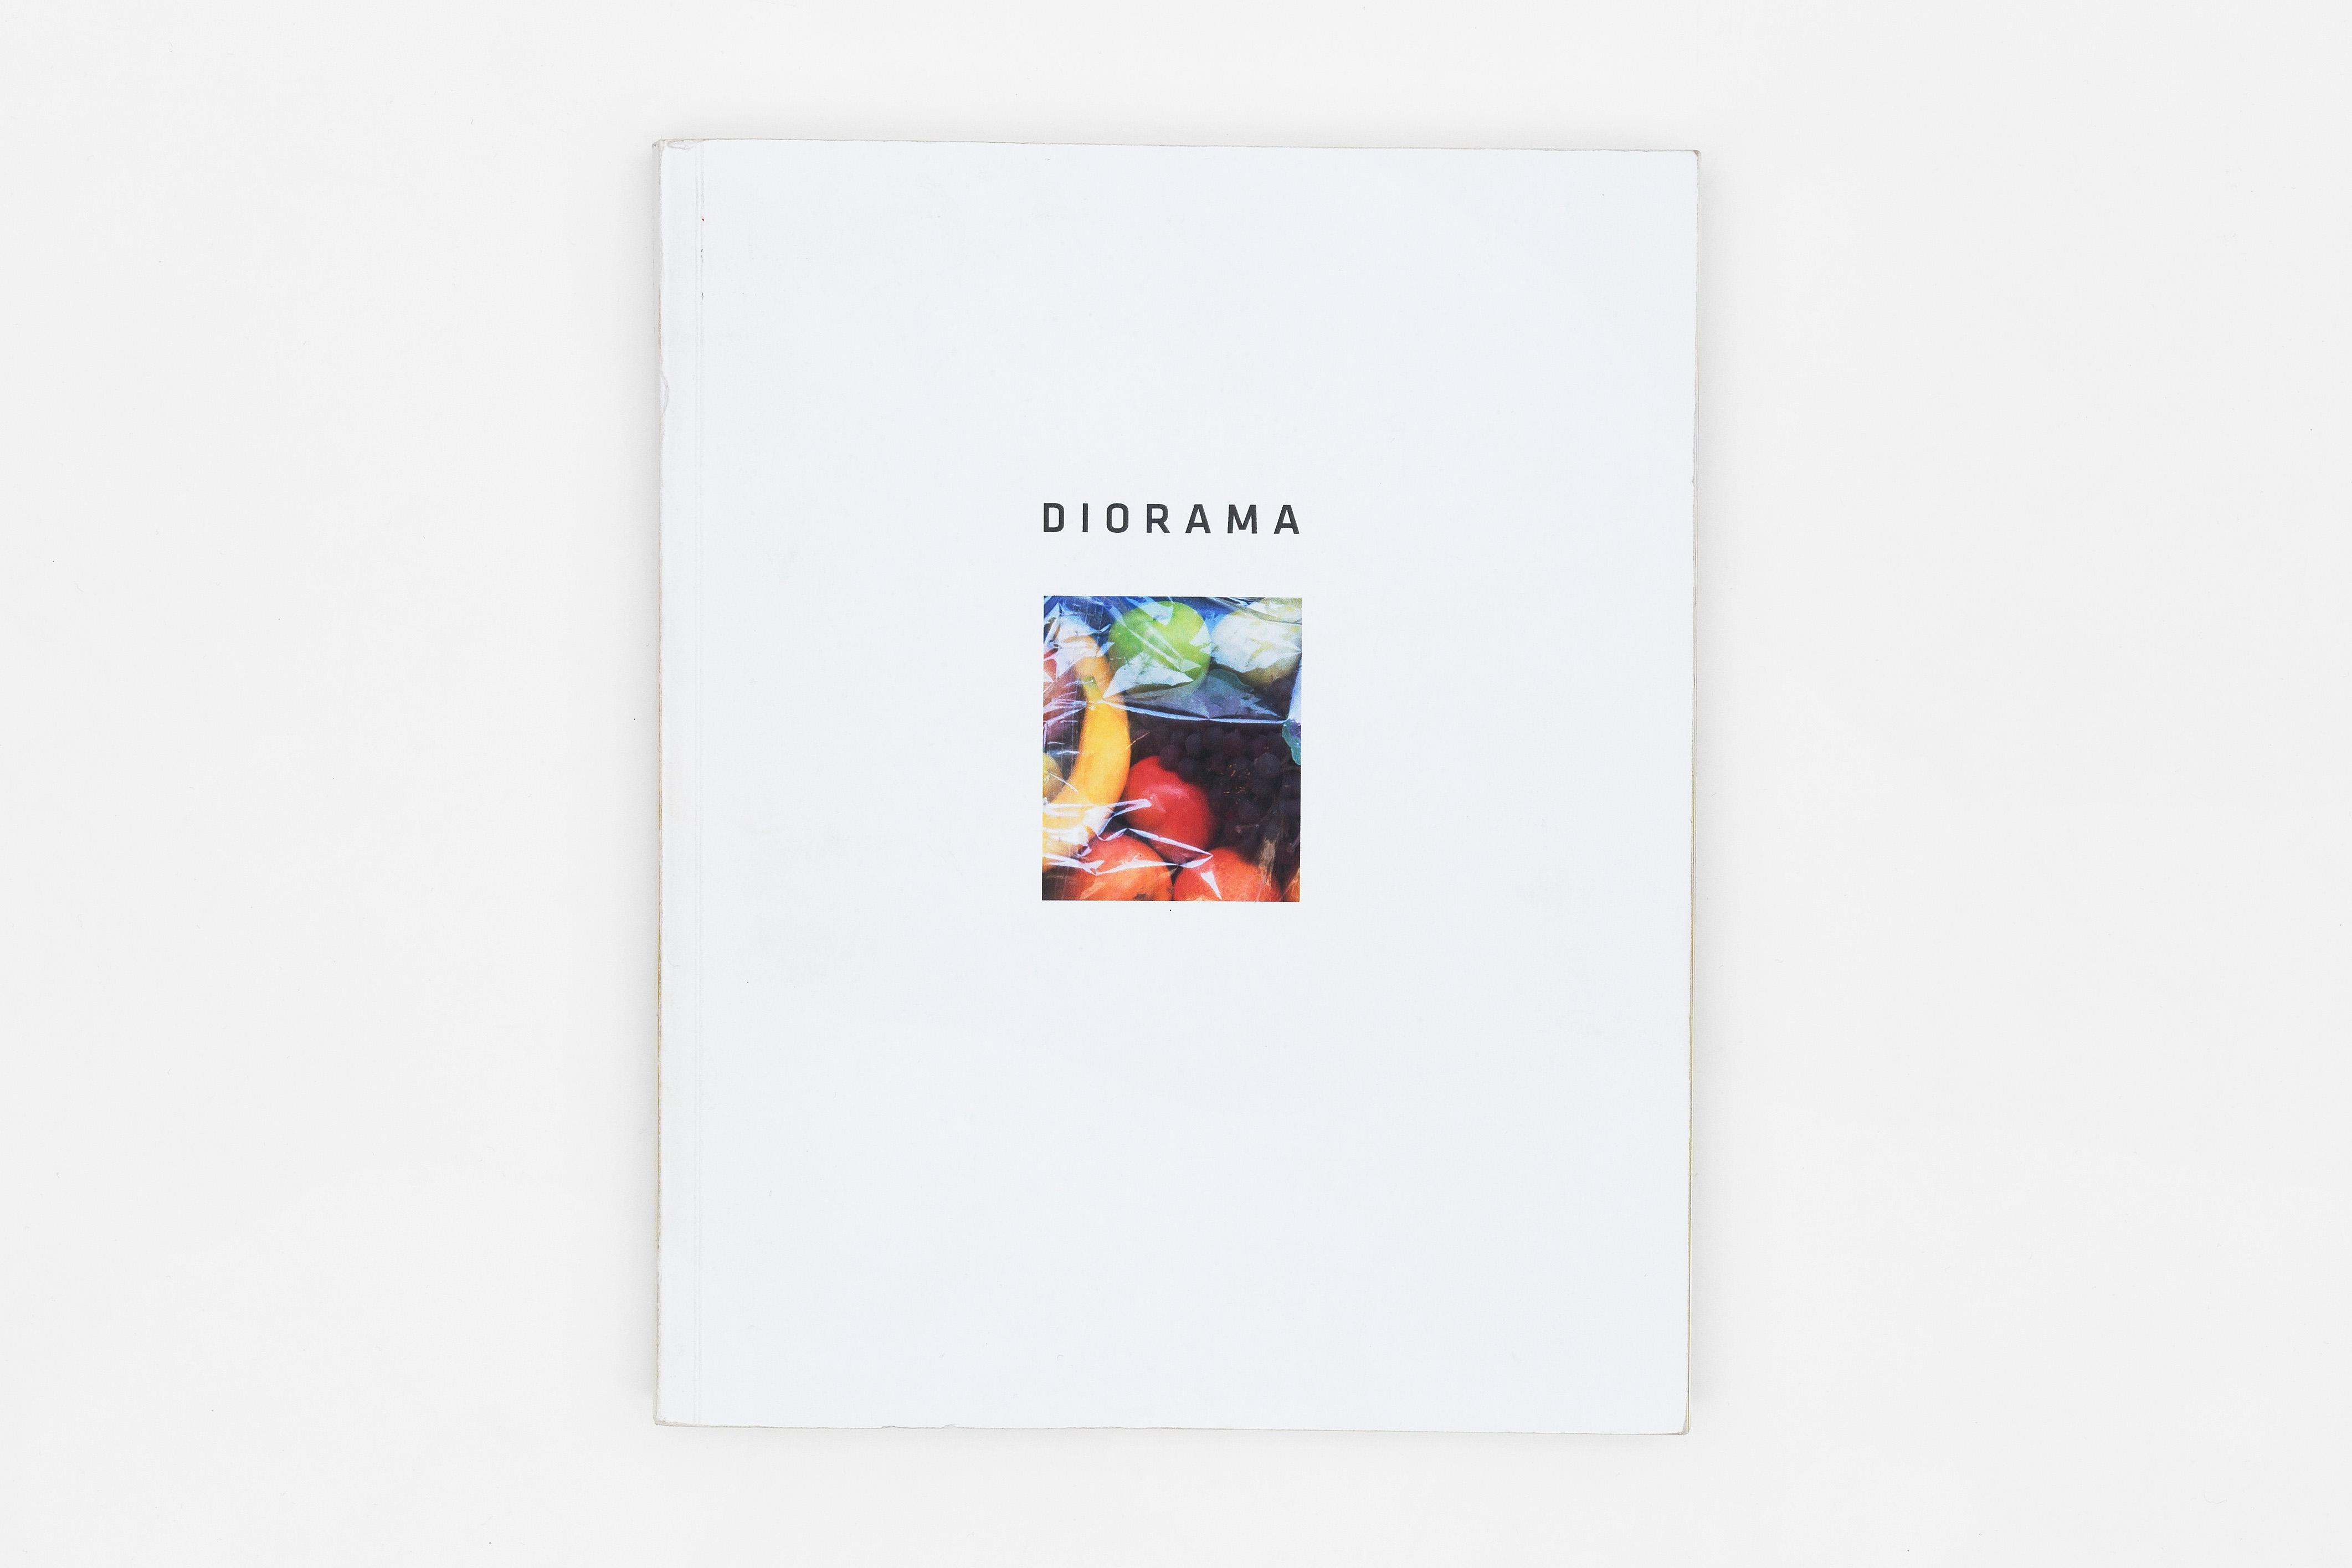 Nicola Leck - Diorama / Esame Triennio ISIA